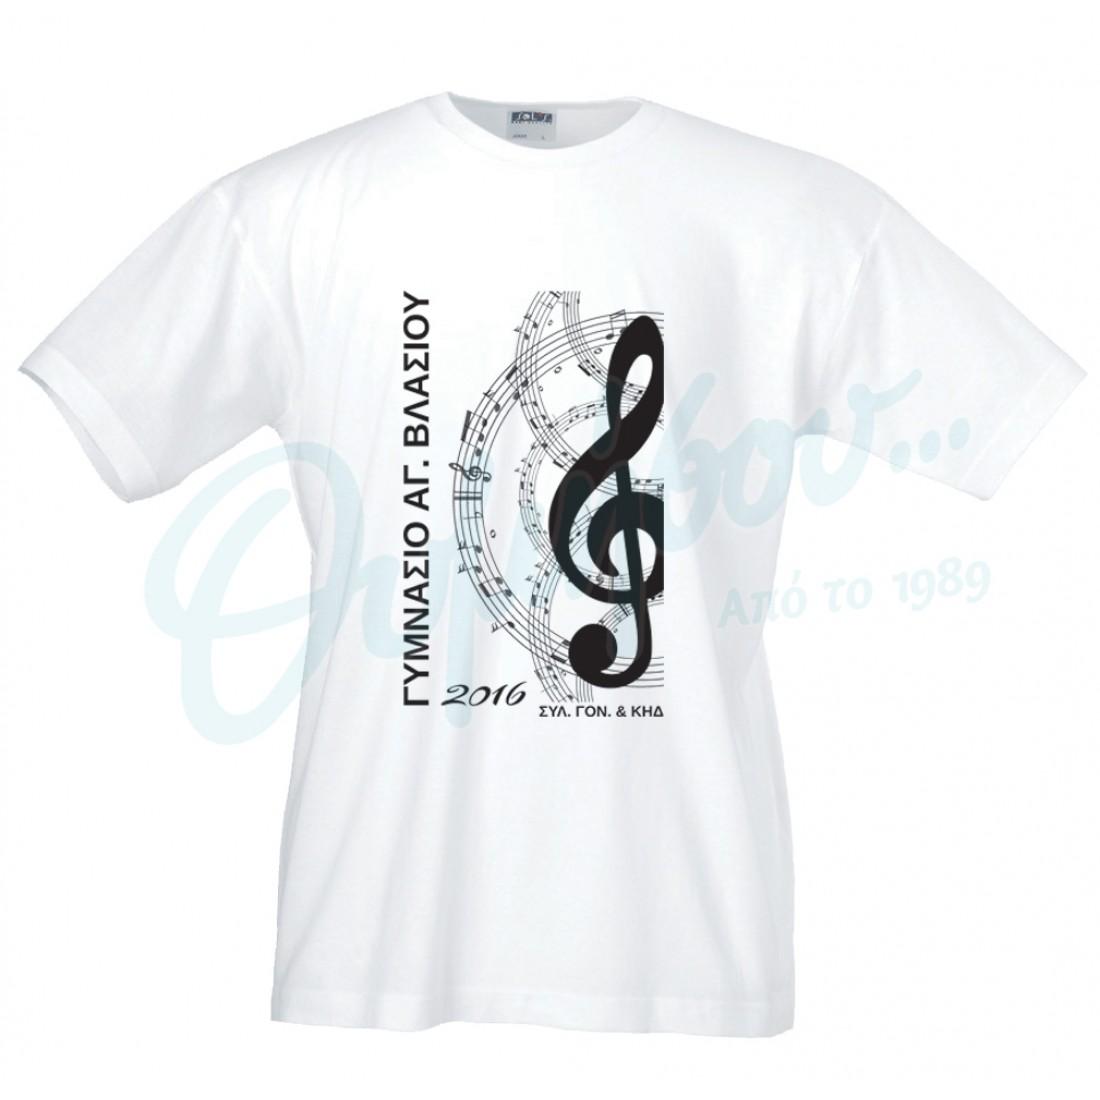 69a6e9b2db82 Λευκά μπλουζάκια με μονόχρωμη εκτύπωση Y1 thimisou.gr